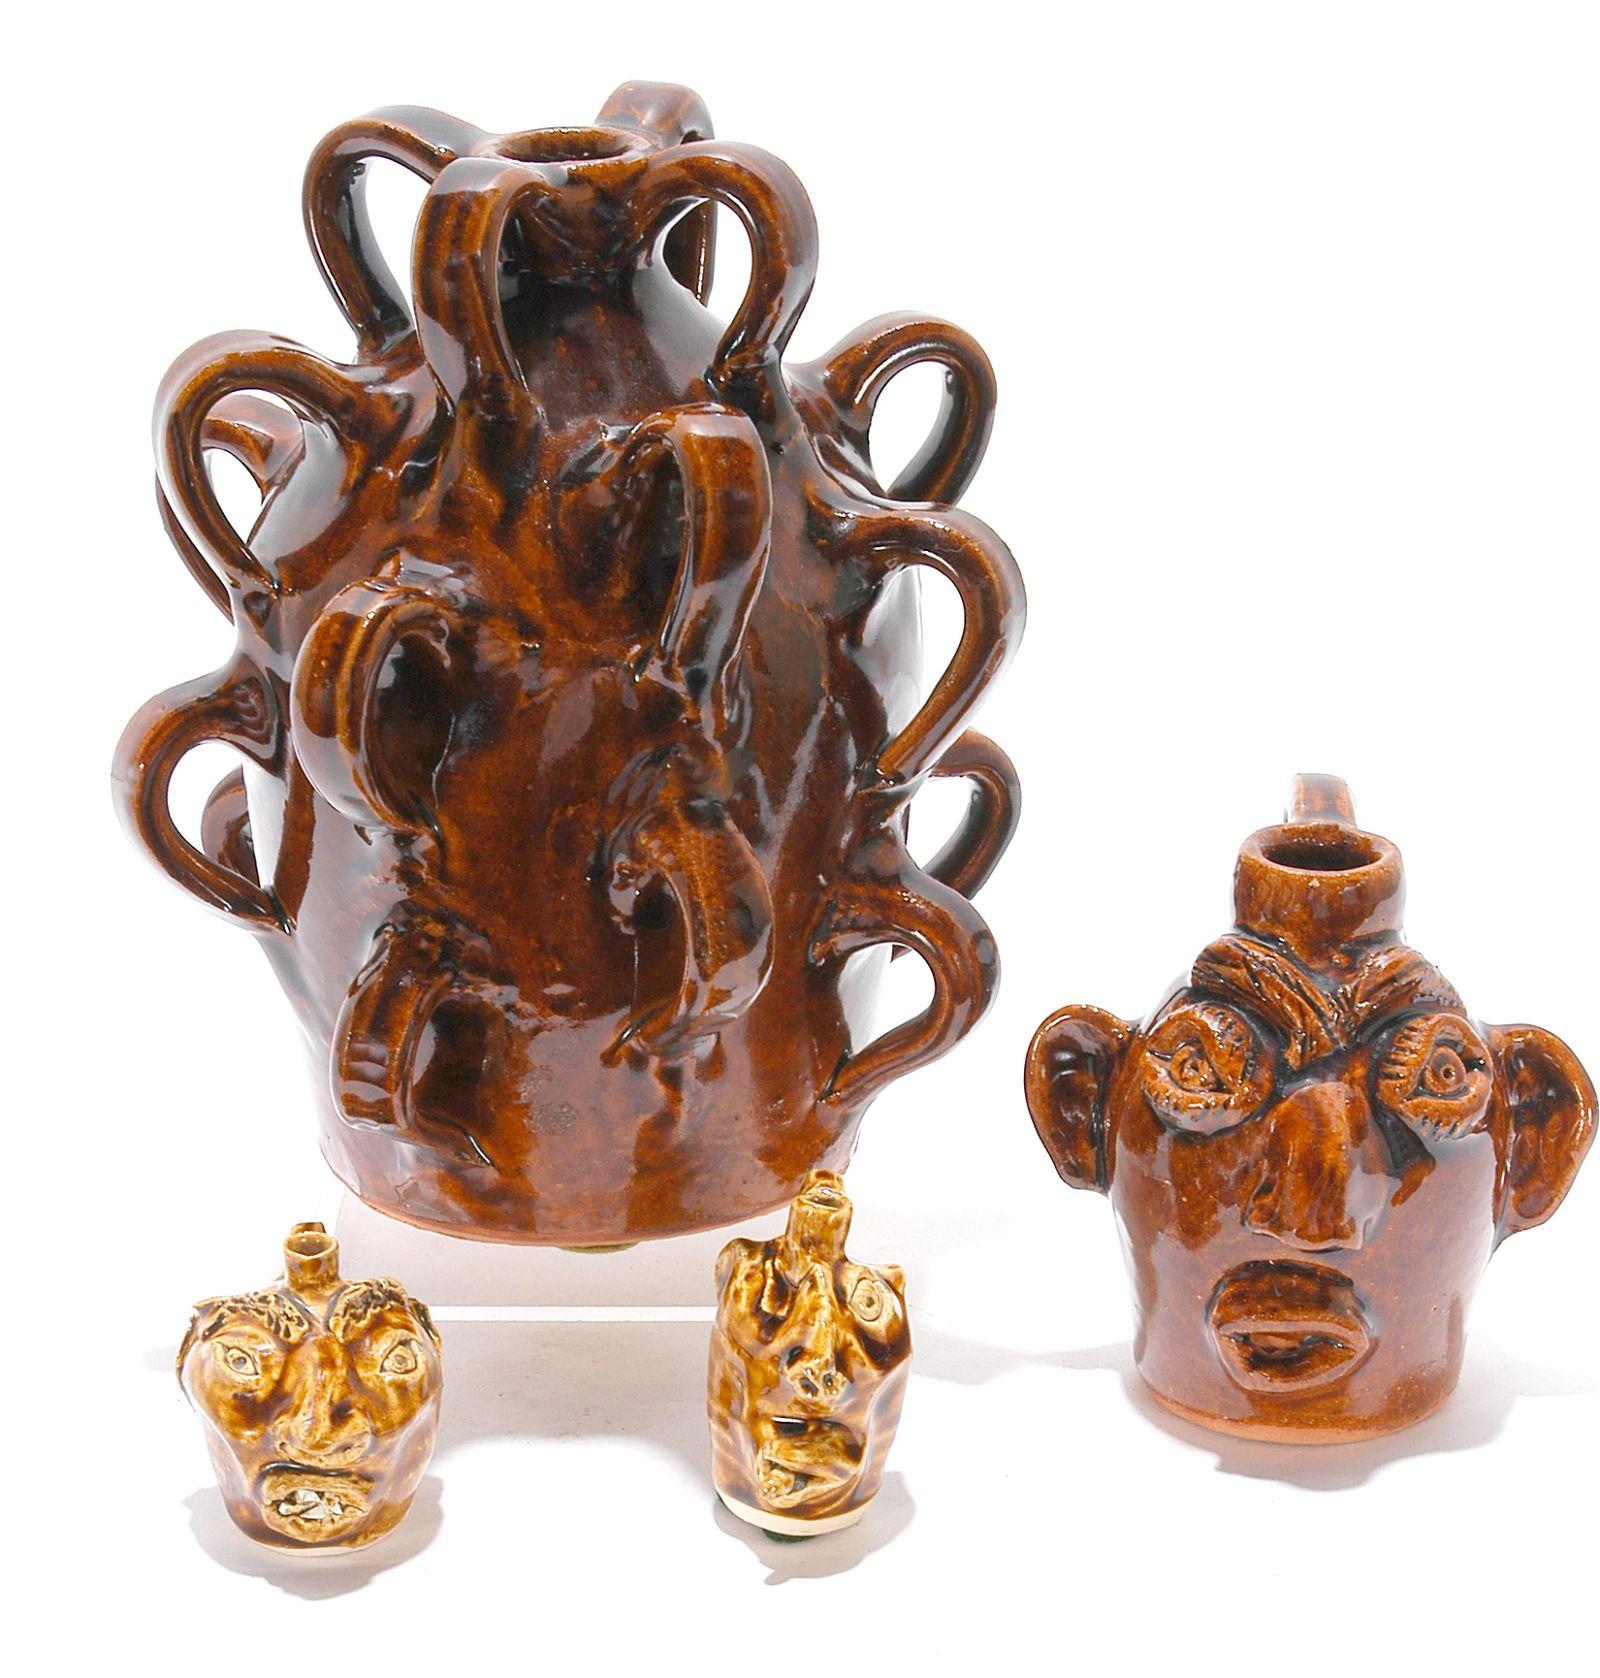 J. Brown Pottery. Drunk Jug & 3 Minis.